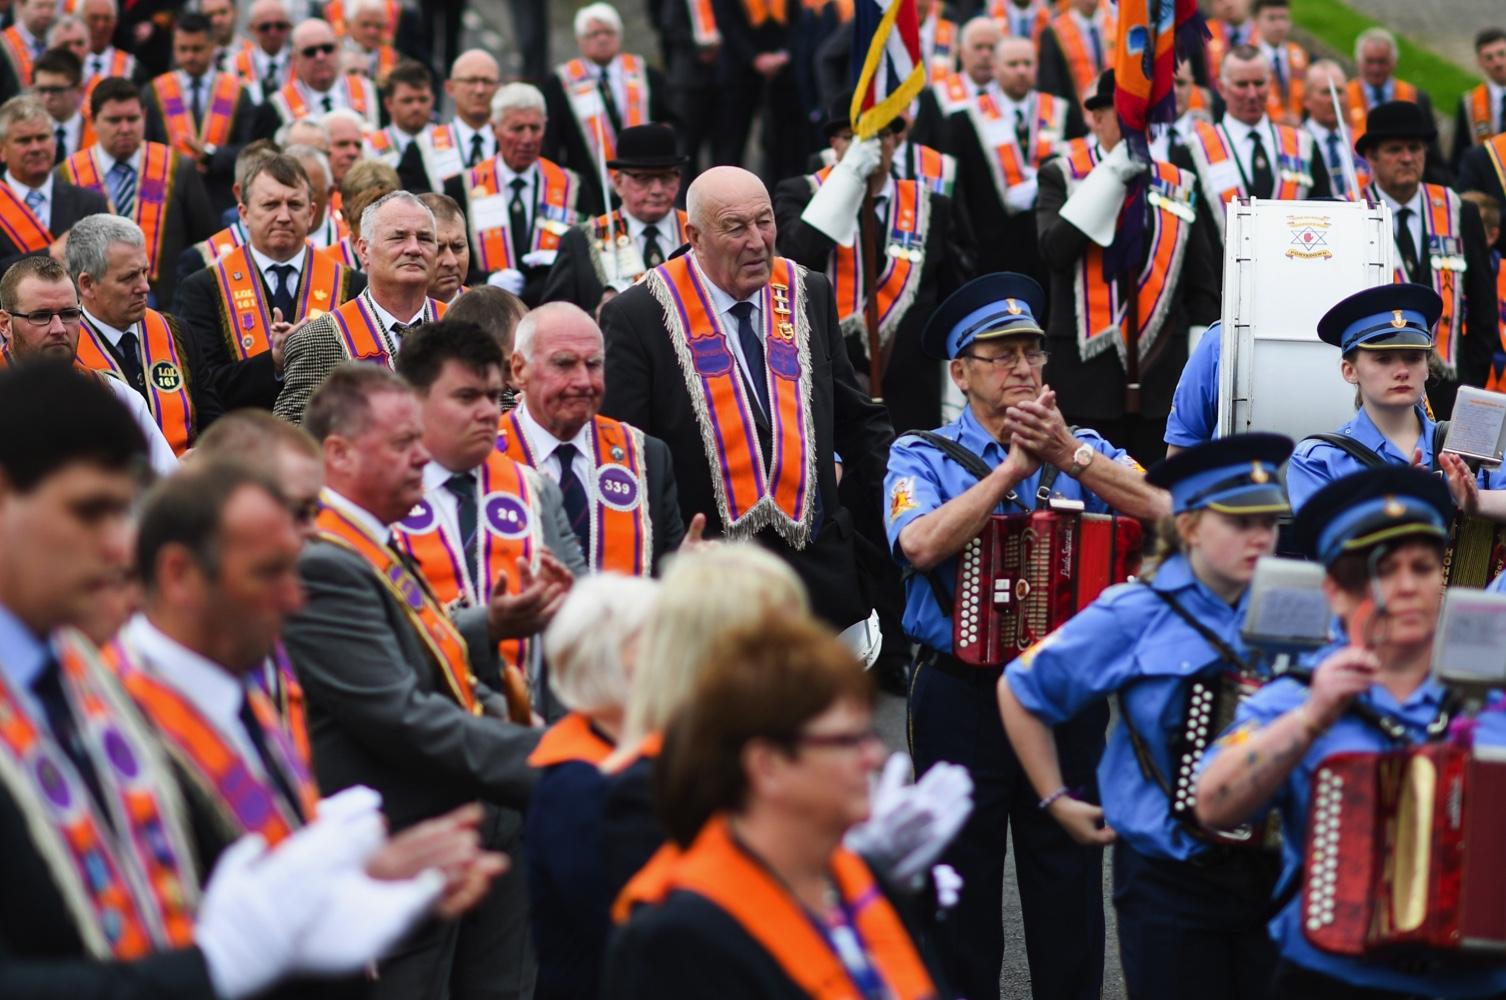 <> on July 9, 2017 in Portadown, Northern Ireland.